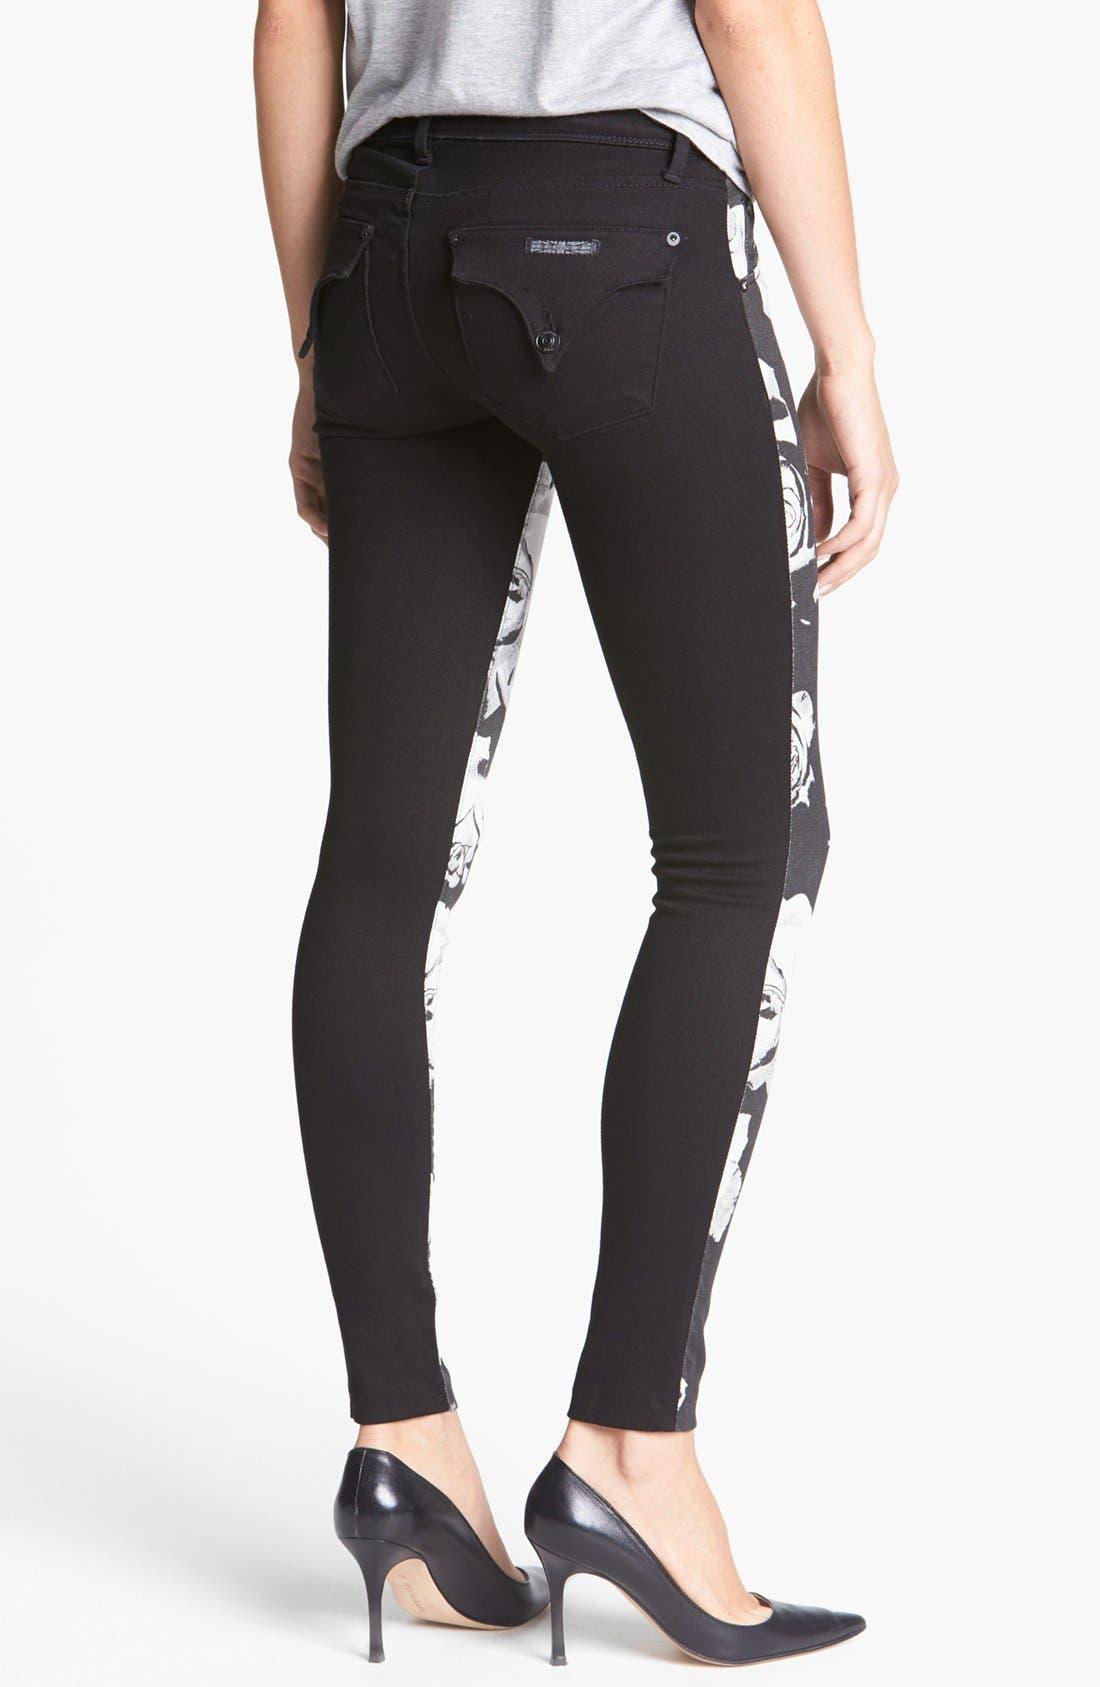 Alternate Image 2  - Hudson Jeans 'Collin' Floral Pattern Skinny Jeans (White/Black)